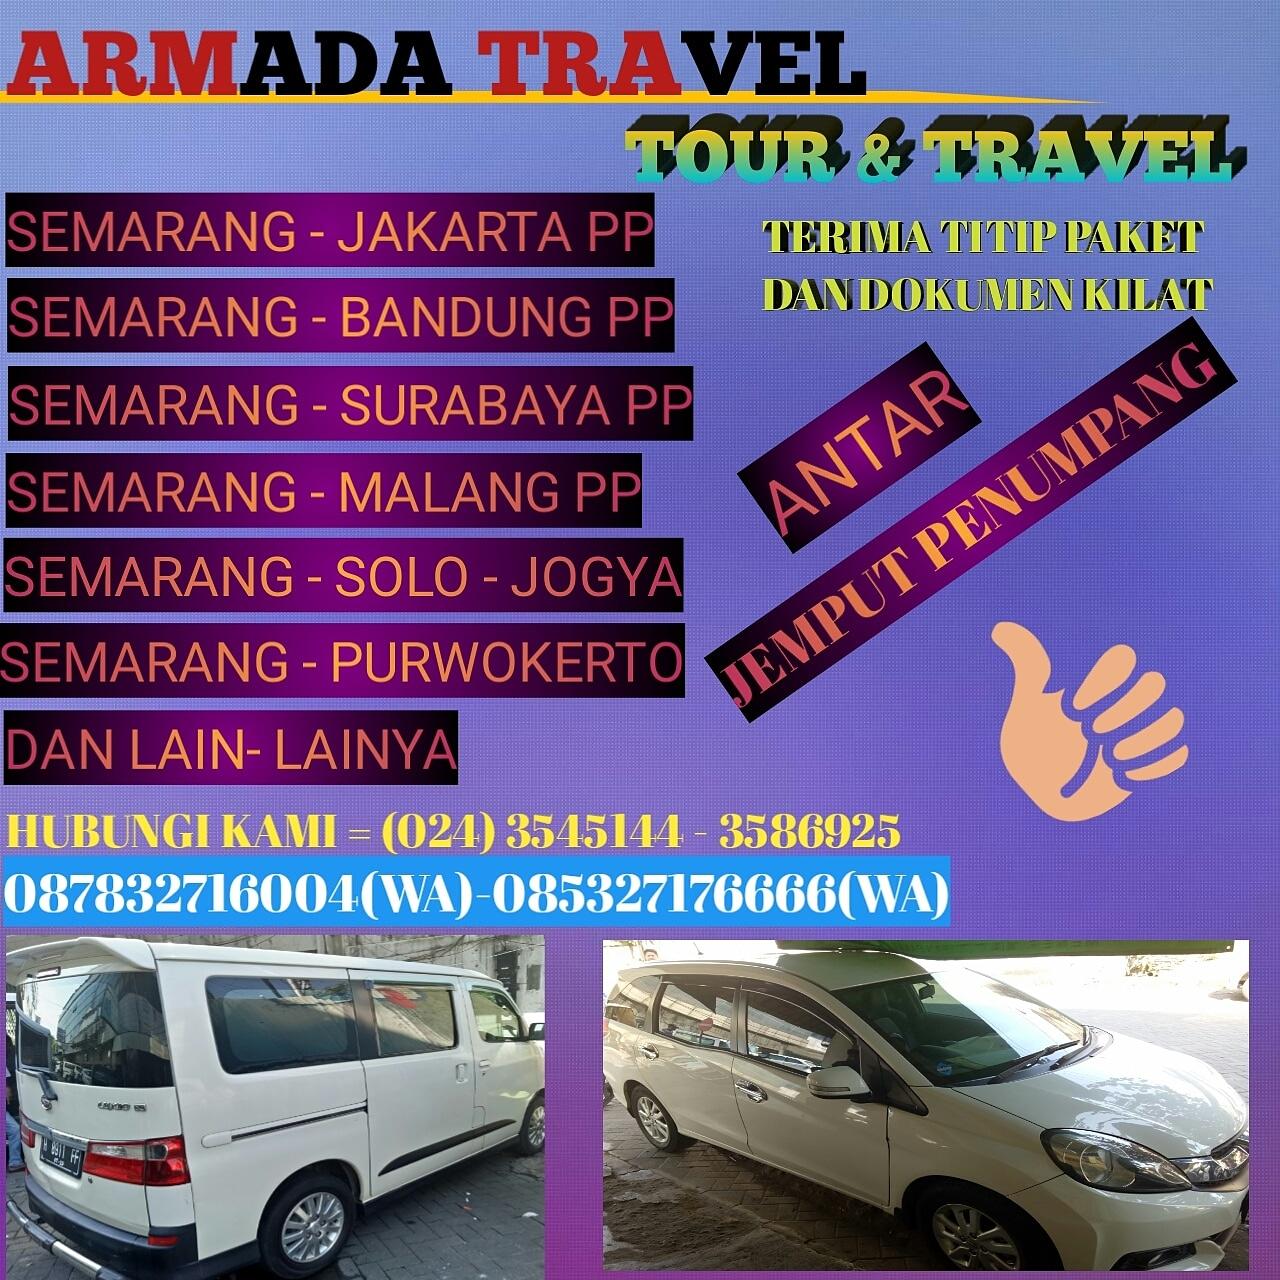 Tour And Travel Jual Tiket Promo Jasa Antar Jemput: Travel Semarang Purwokerto